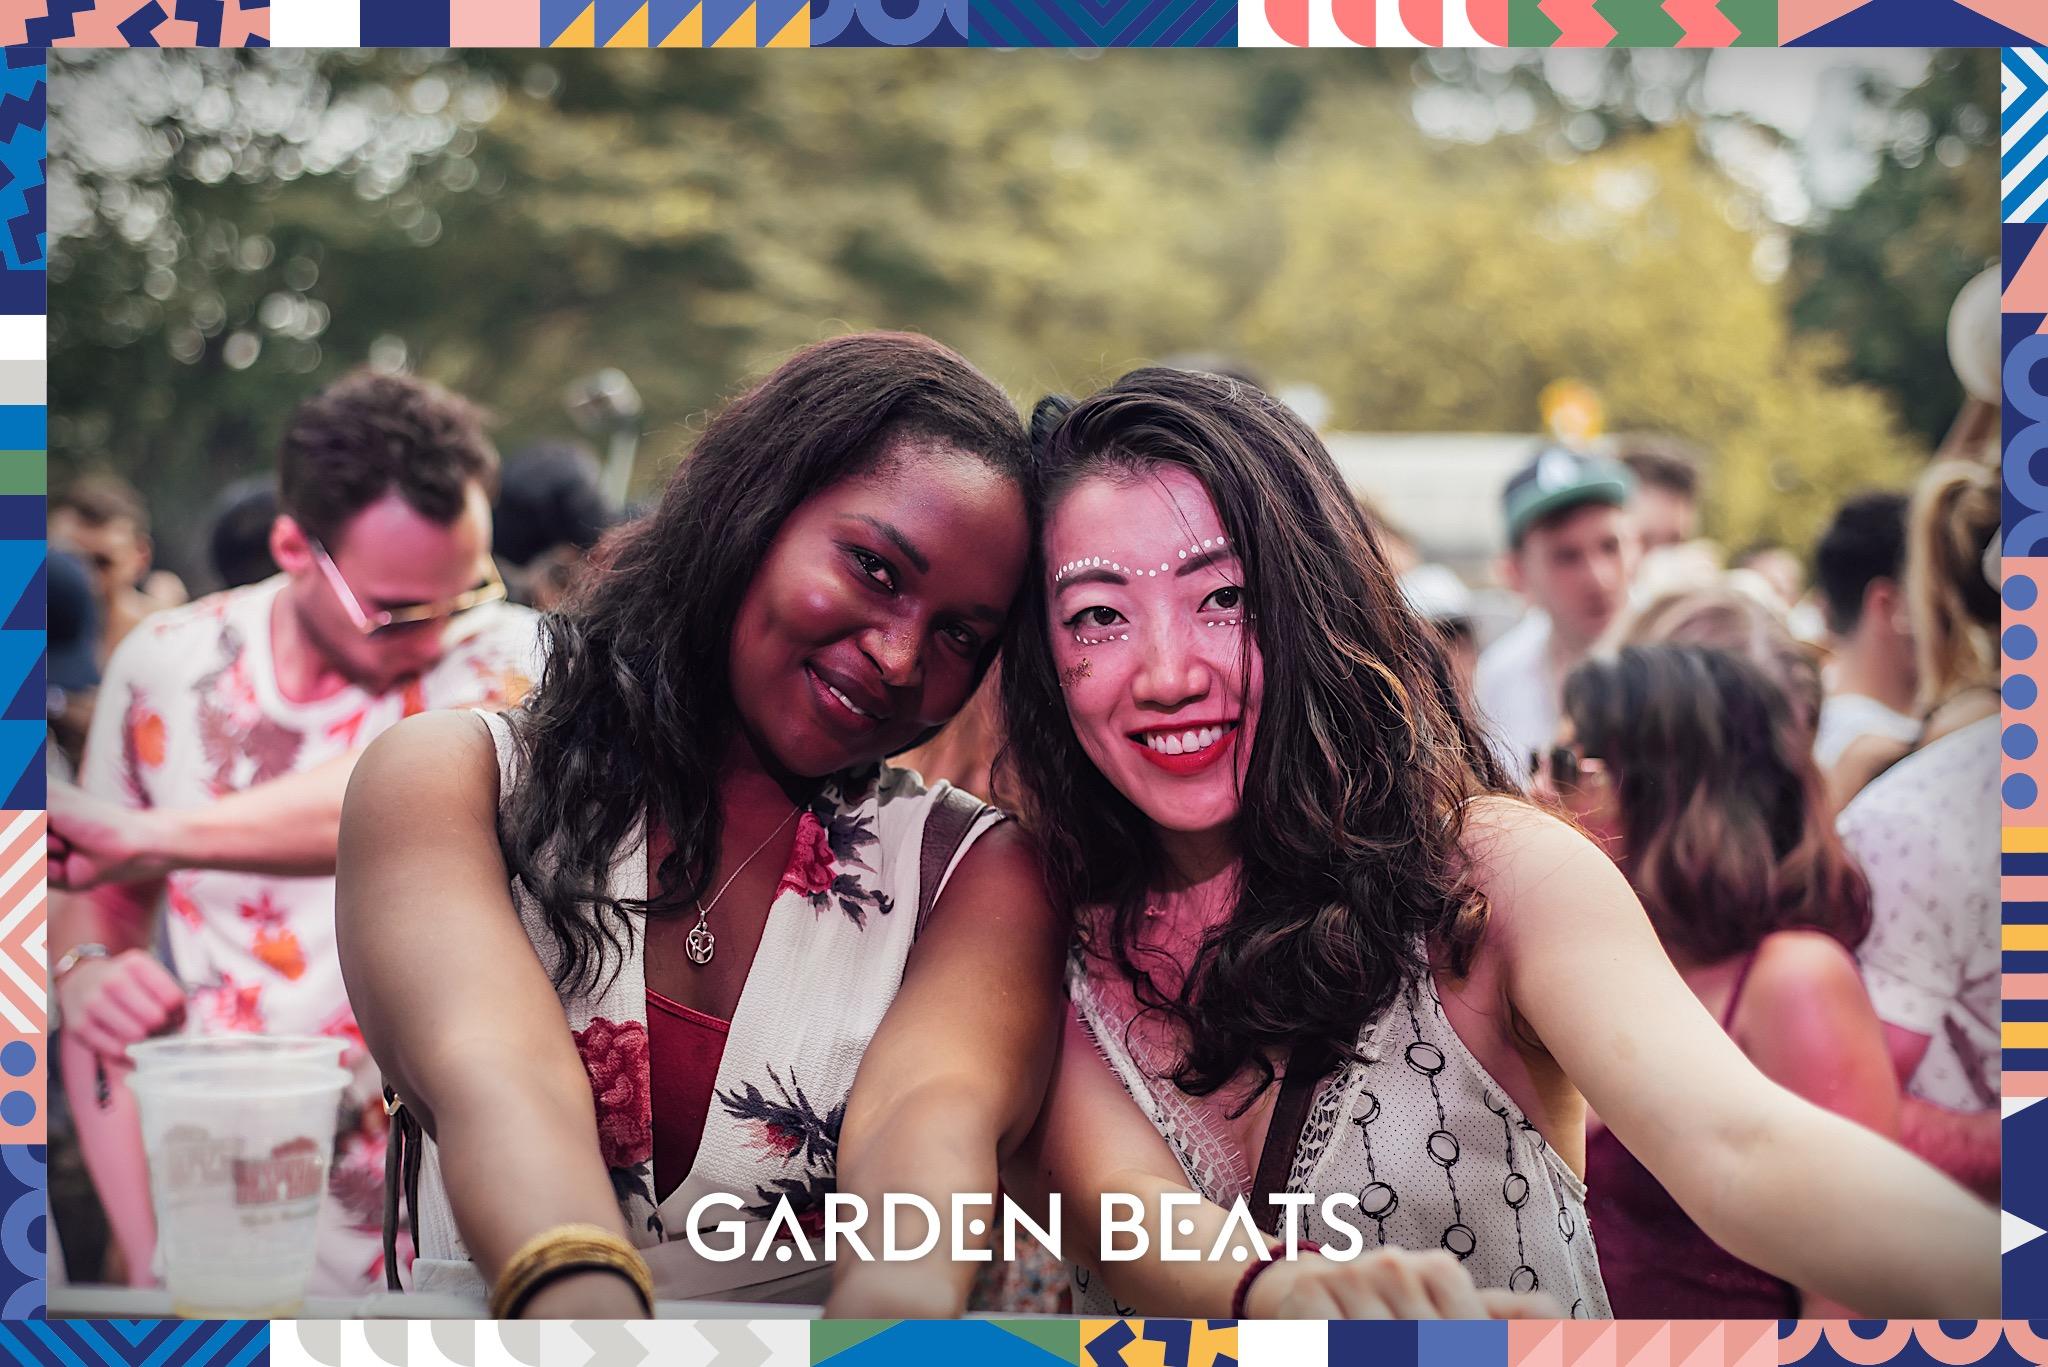 18032017_GardenBeats_Colossal653_WatermarkedGB.jpg